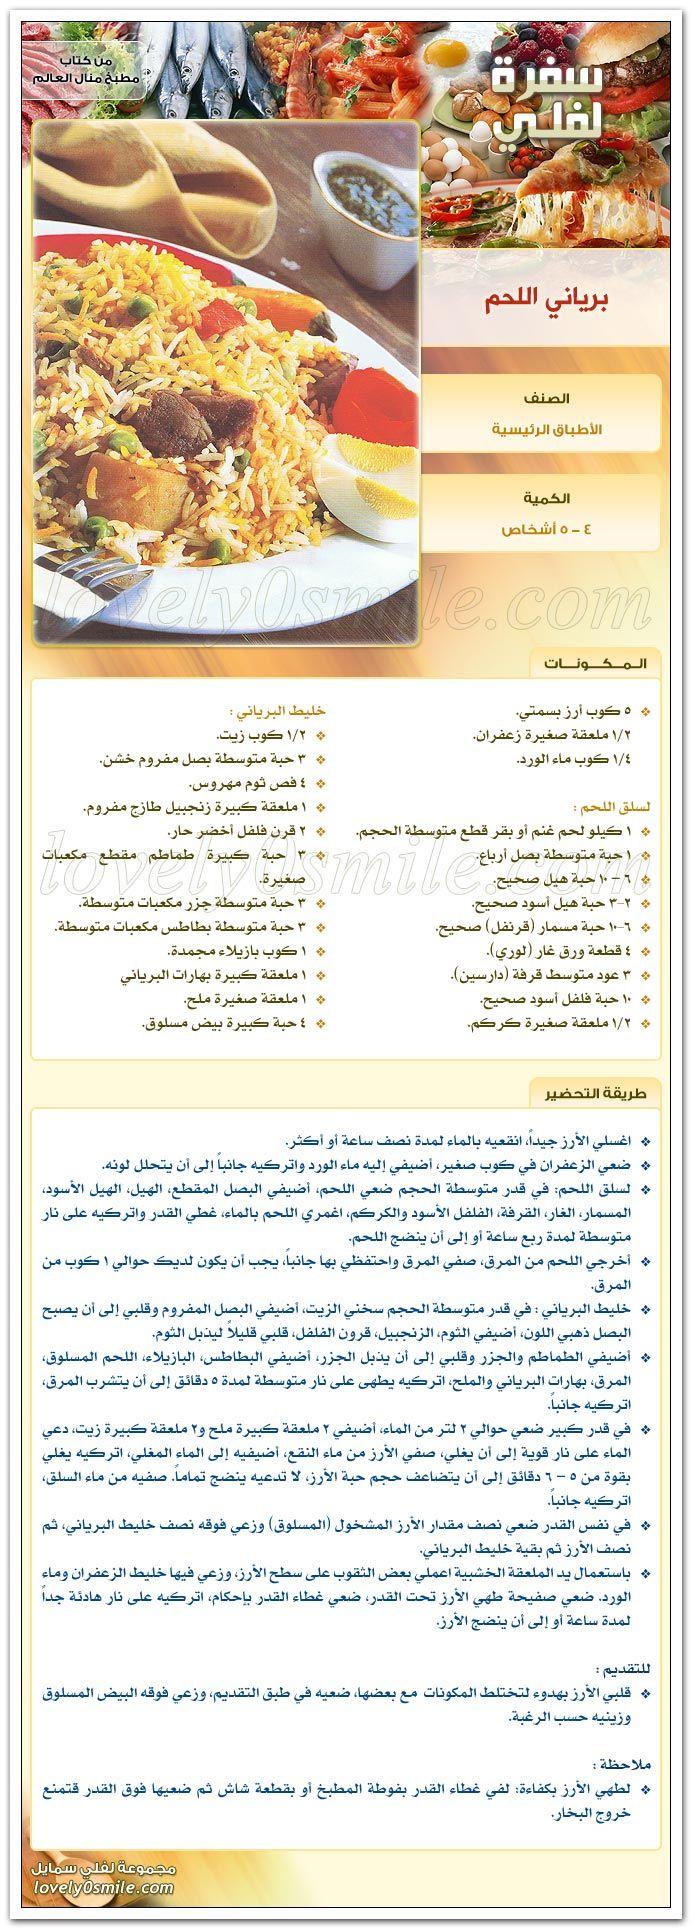 برياني اللحم Egyptian Food Food Recipies Recipes